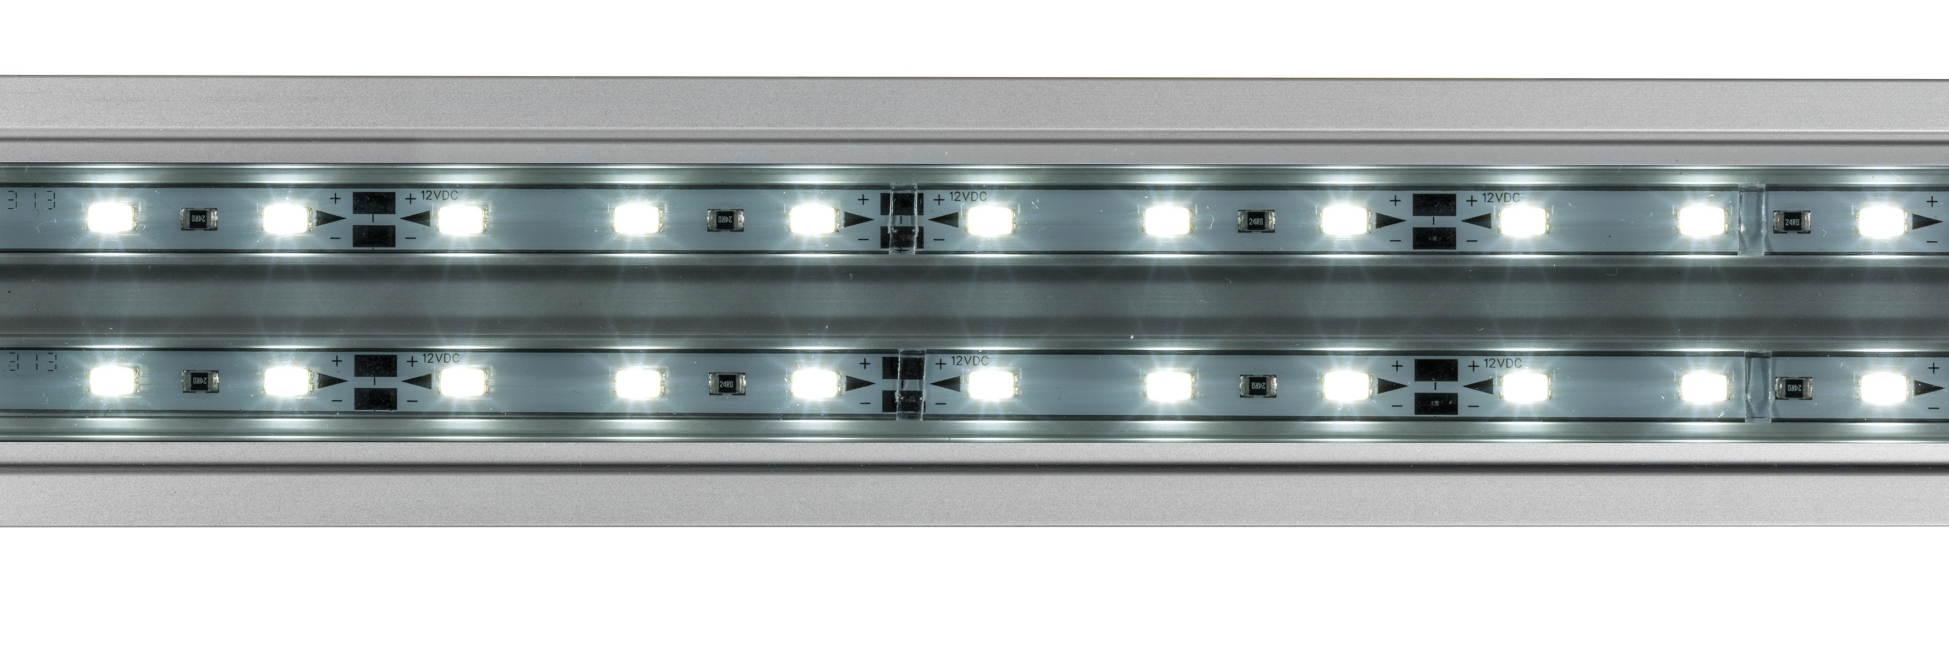 Preise EHEIM Power LED daylight